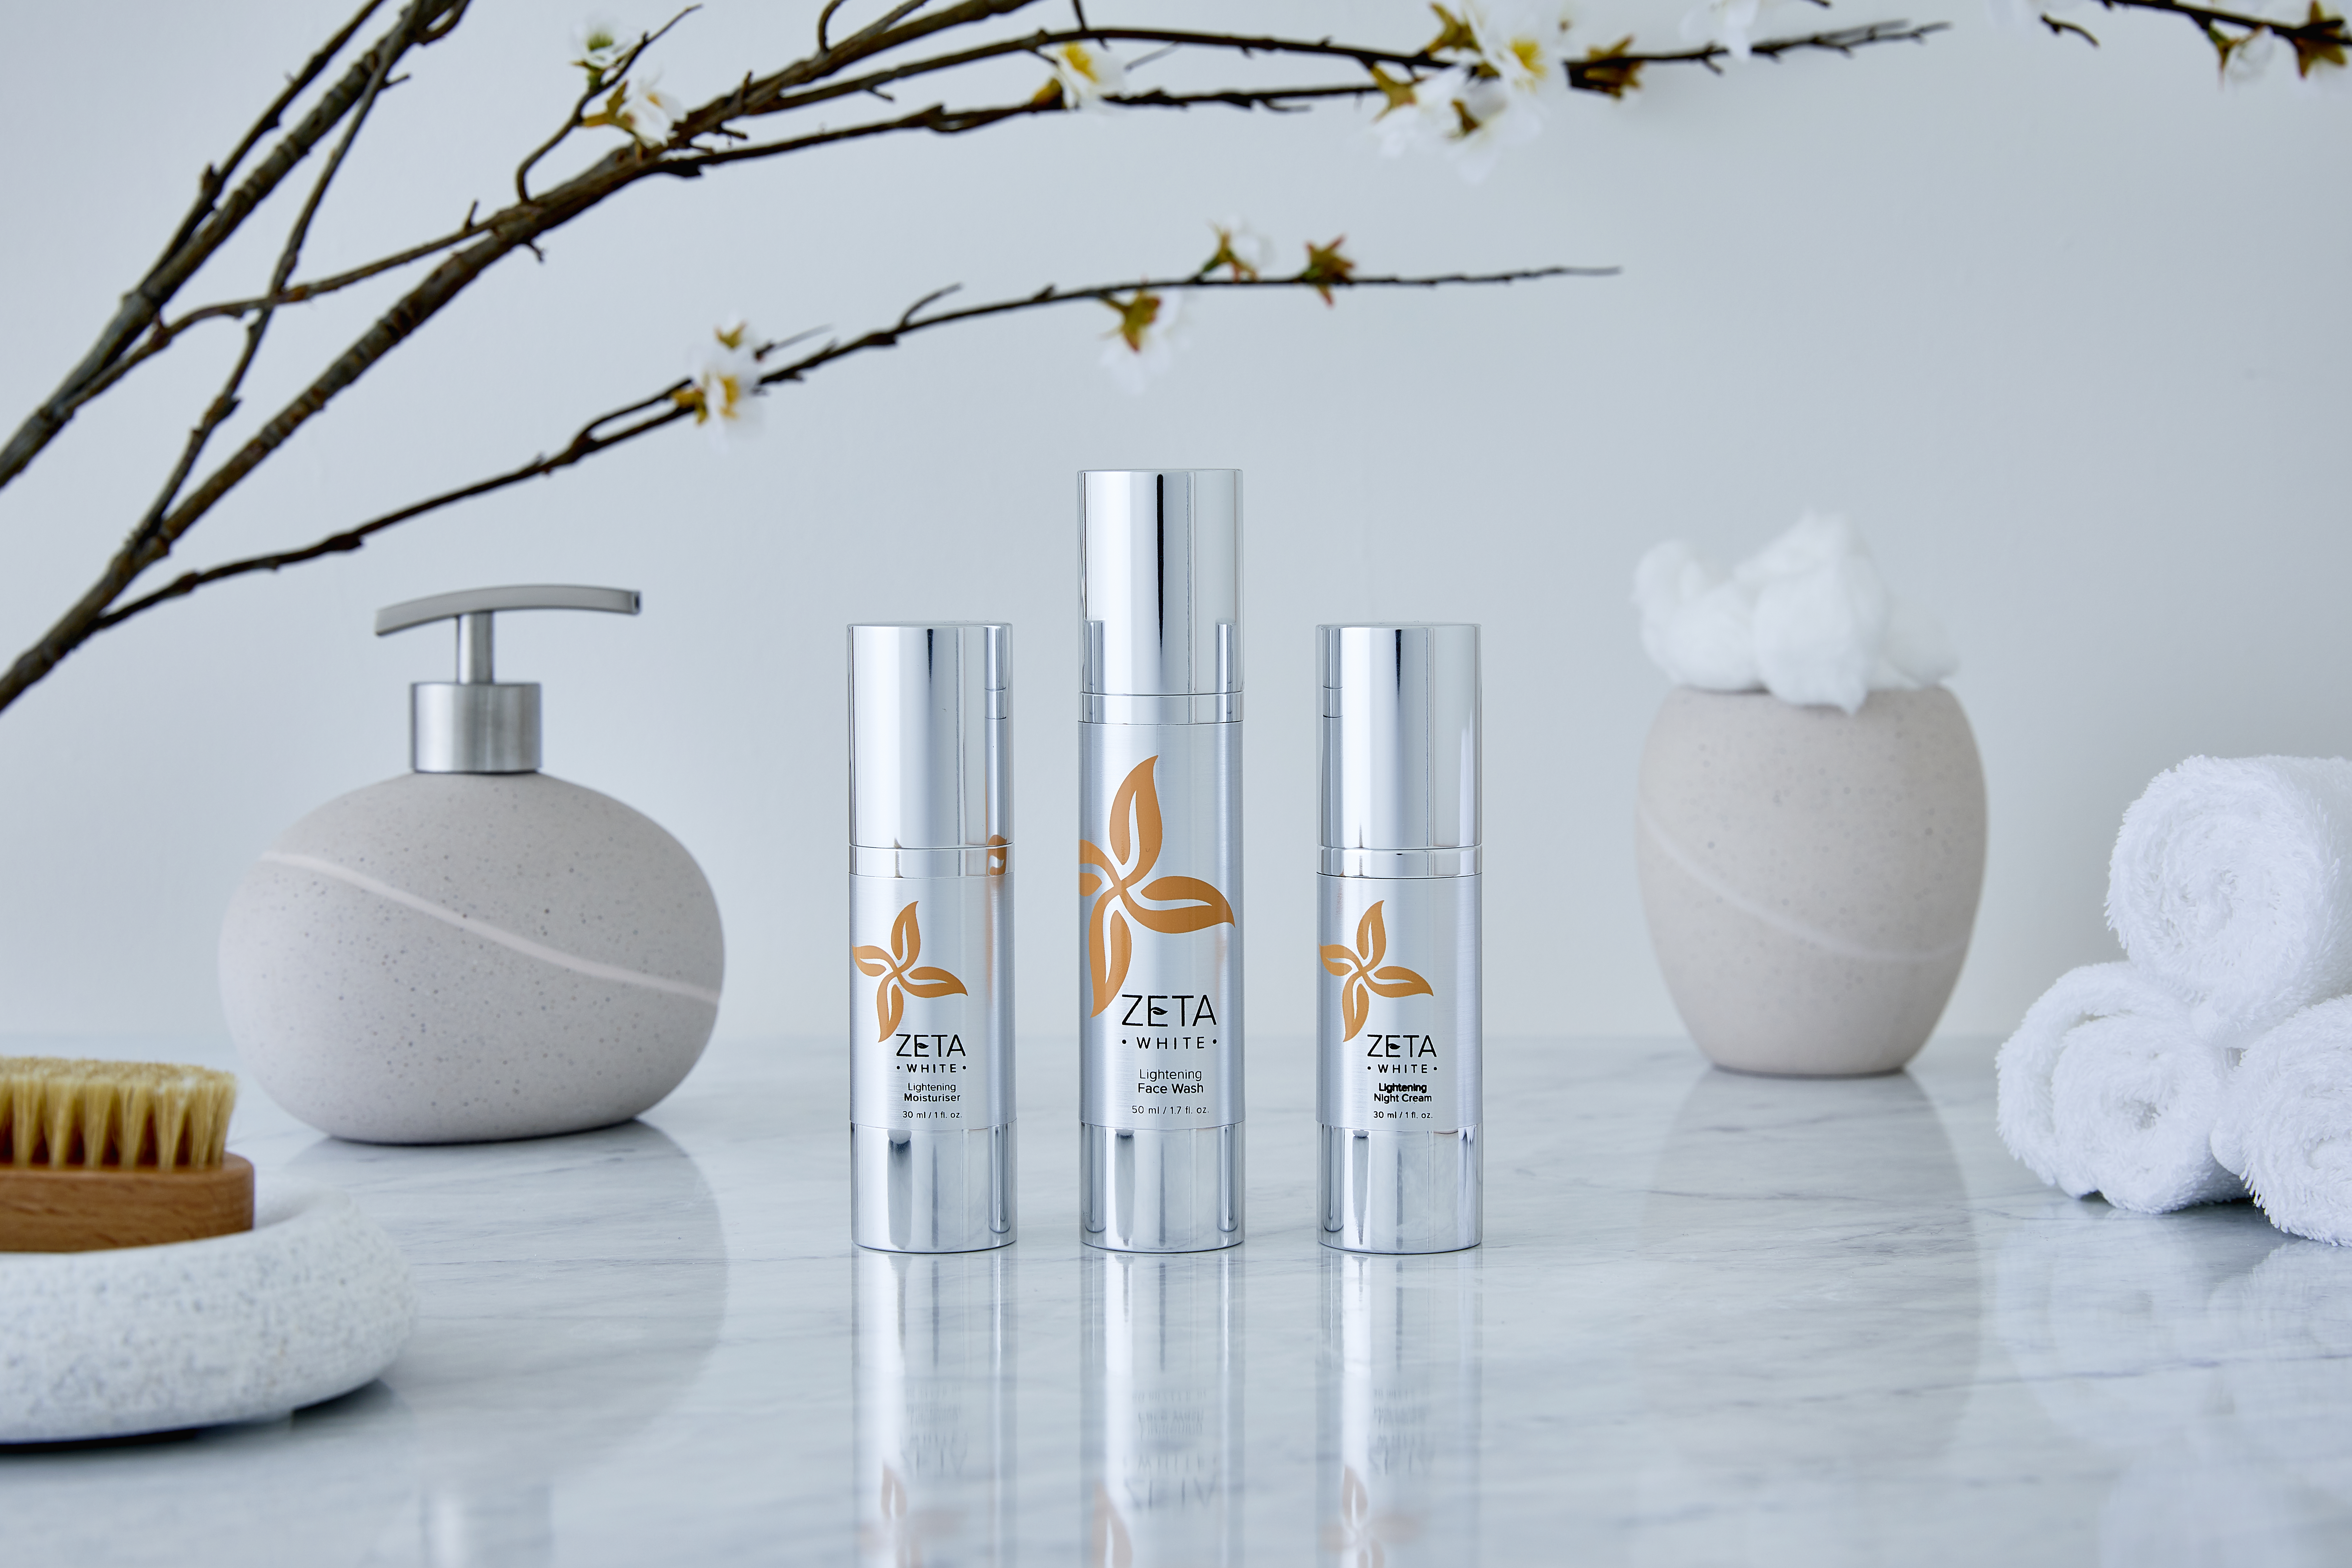 Zeta White Review The Best Skin Lightening Cream Or A Dud